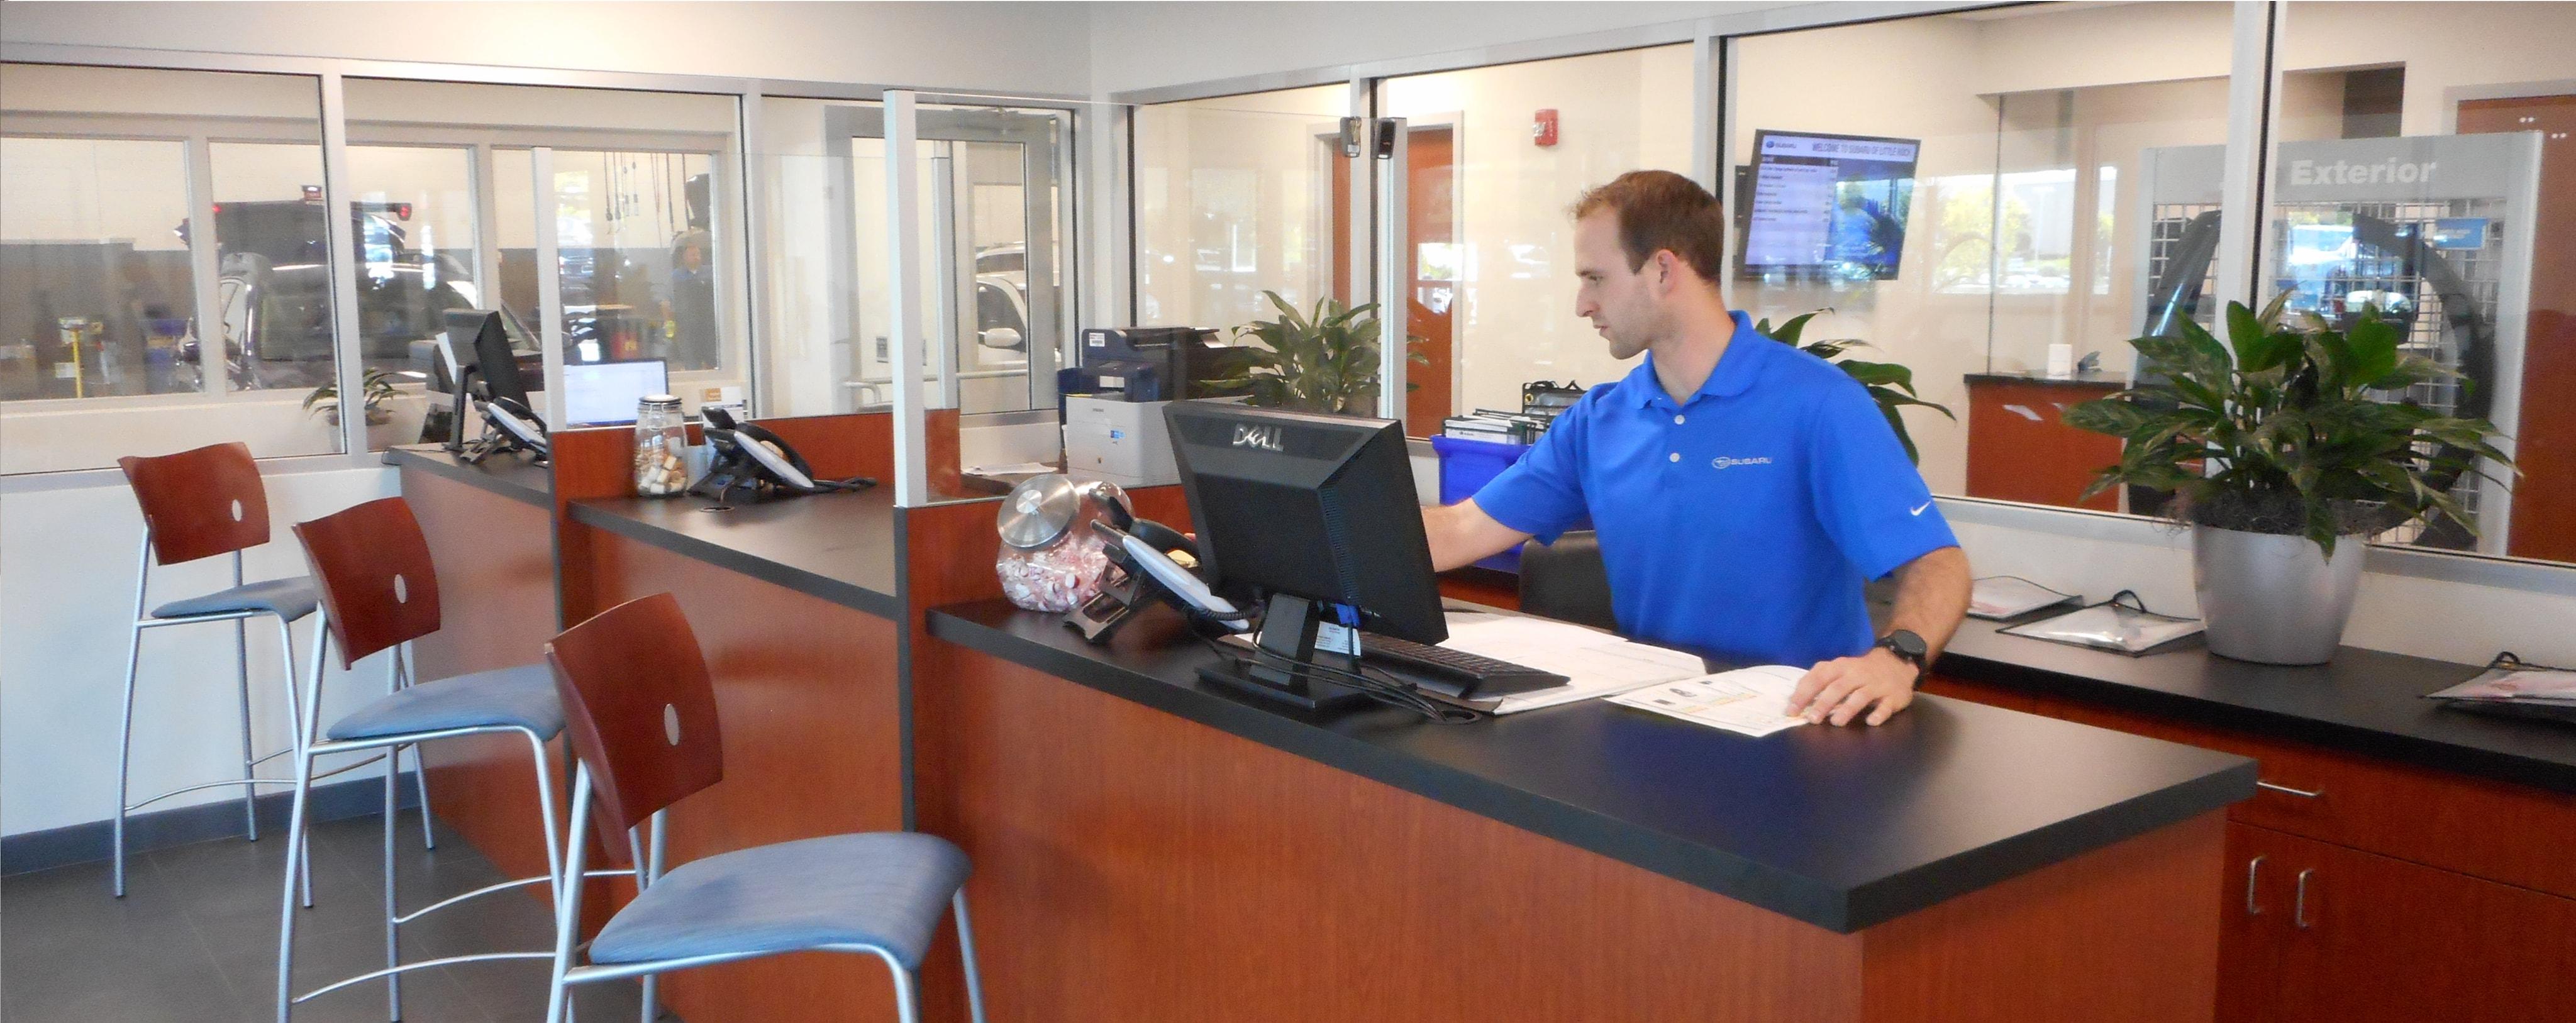 Subaru Car Repair And Service In Little Rock Subaru Of